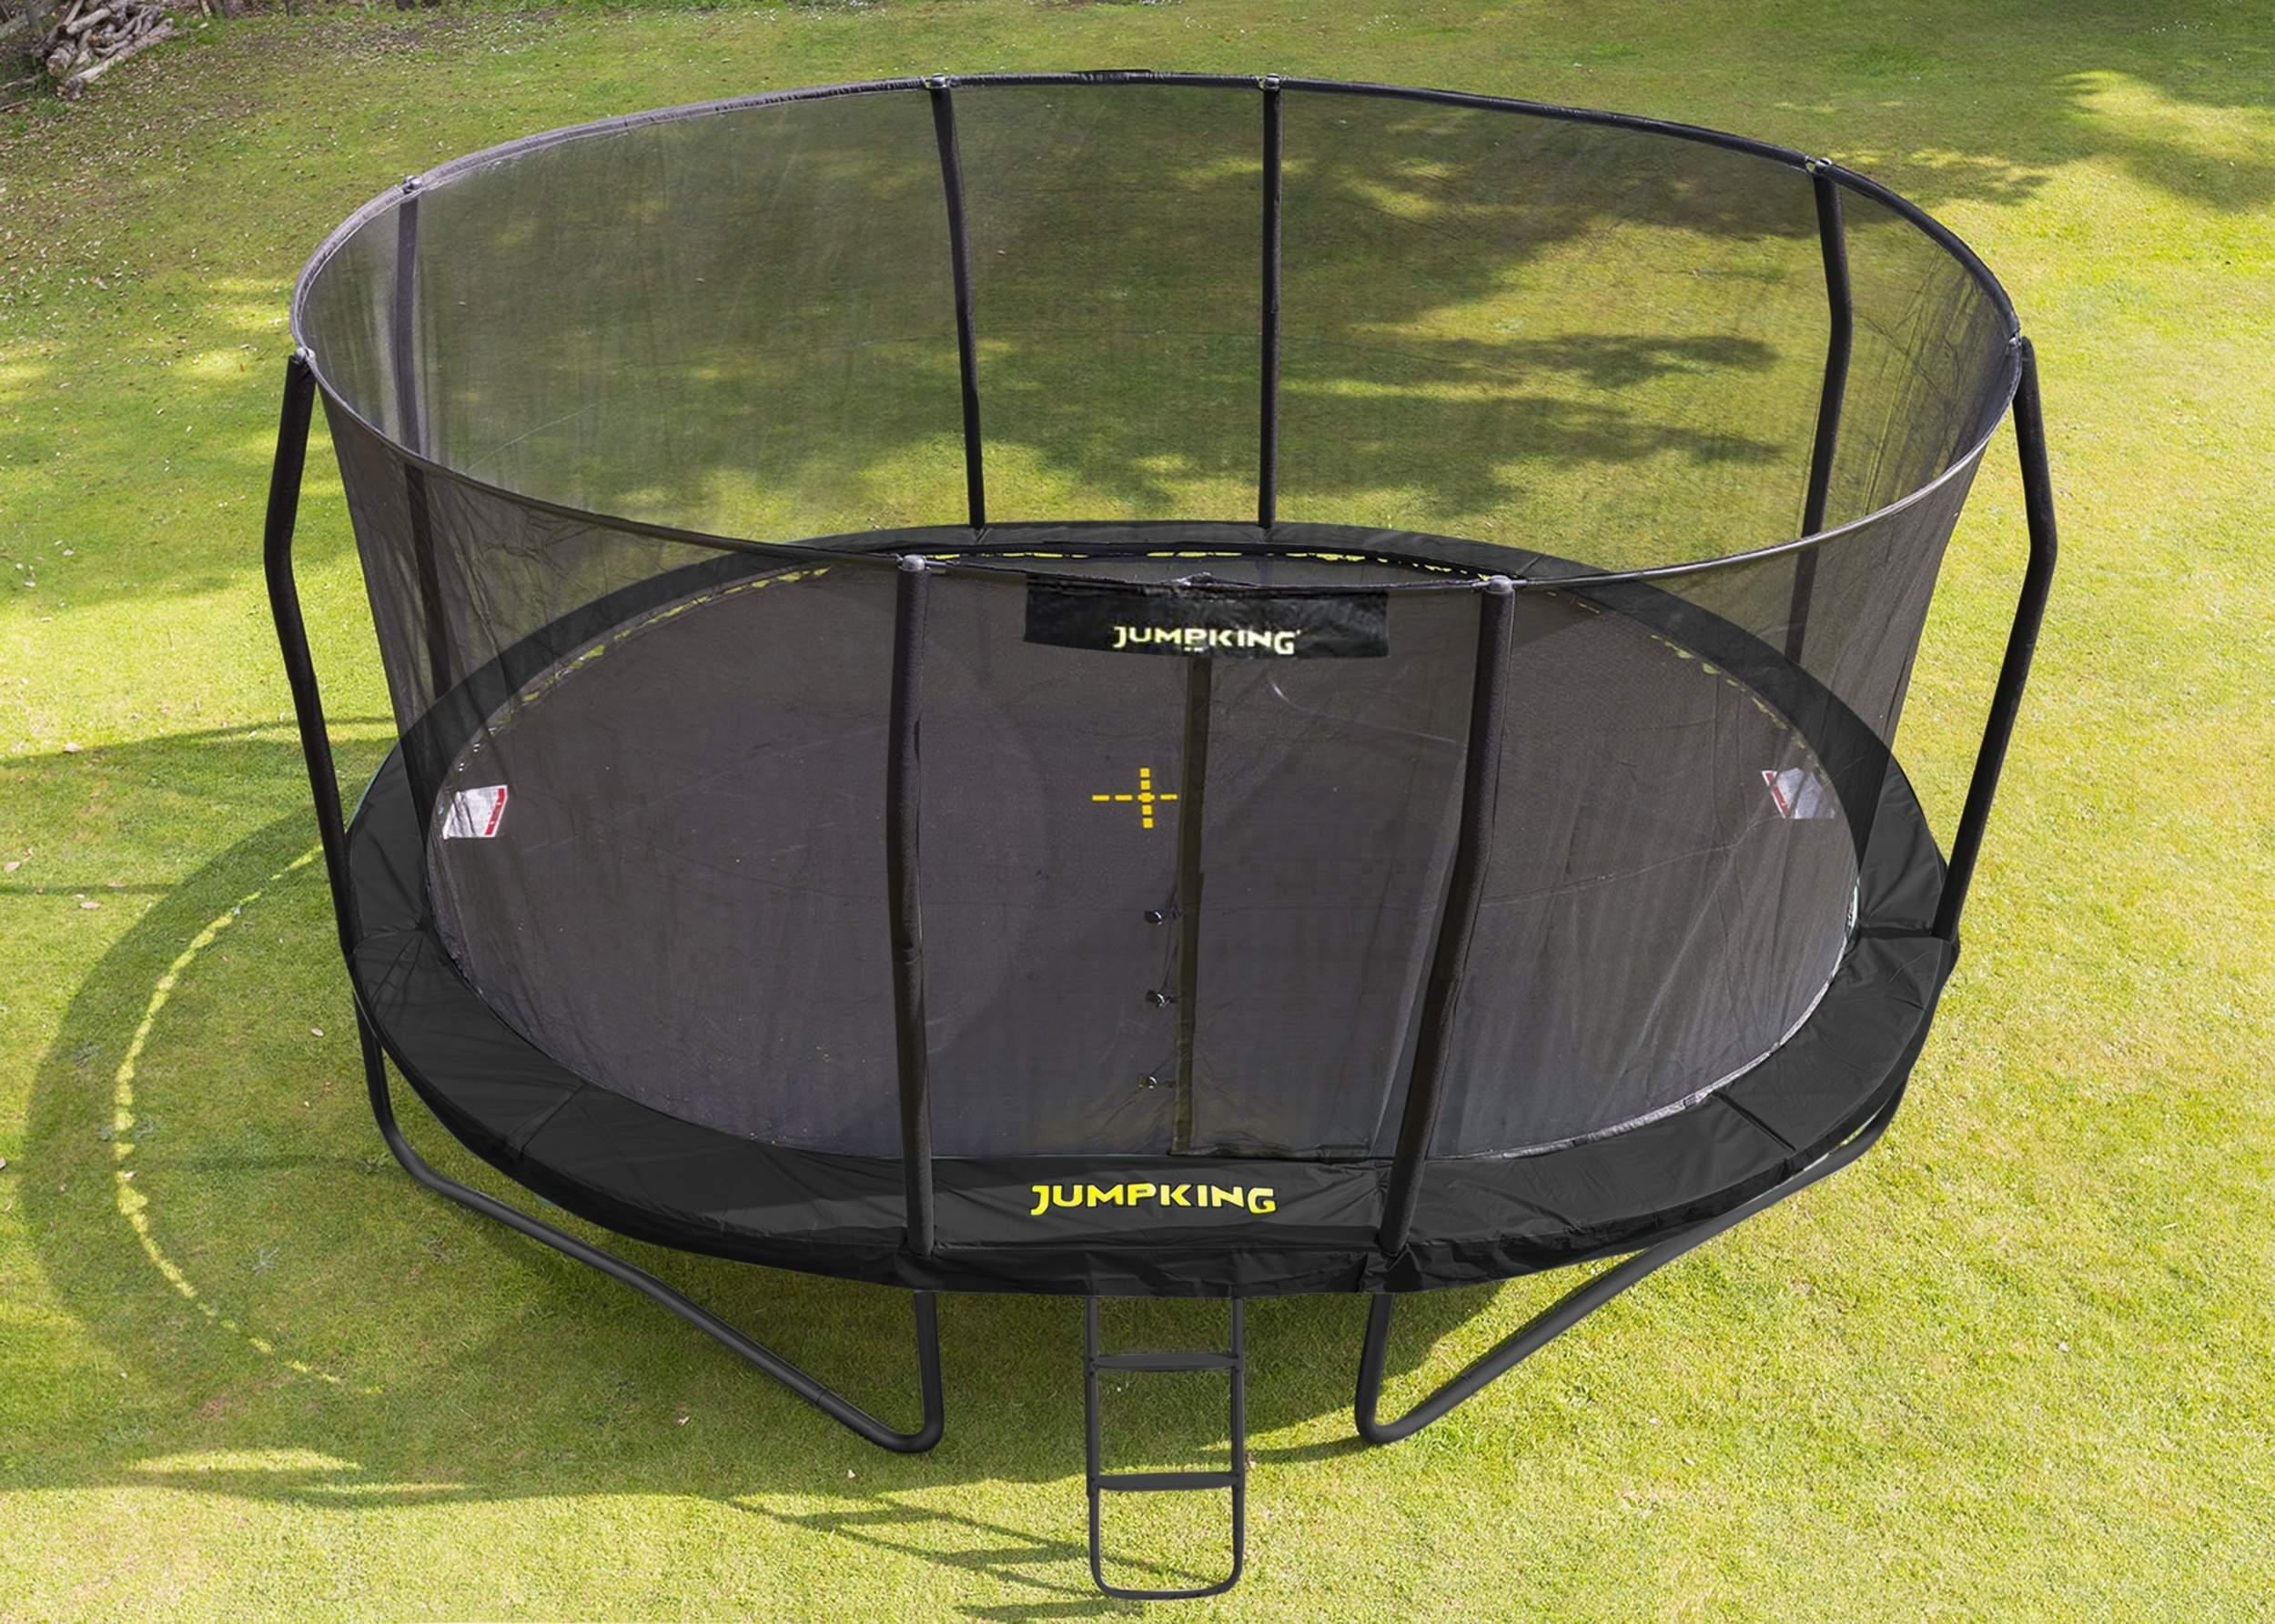 jumpking trampoline met net en ladder jumppod oval 518 x 427 cm zwart 2016 3